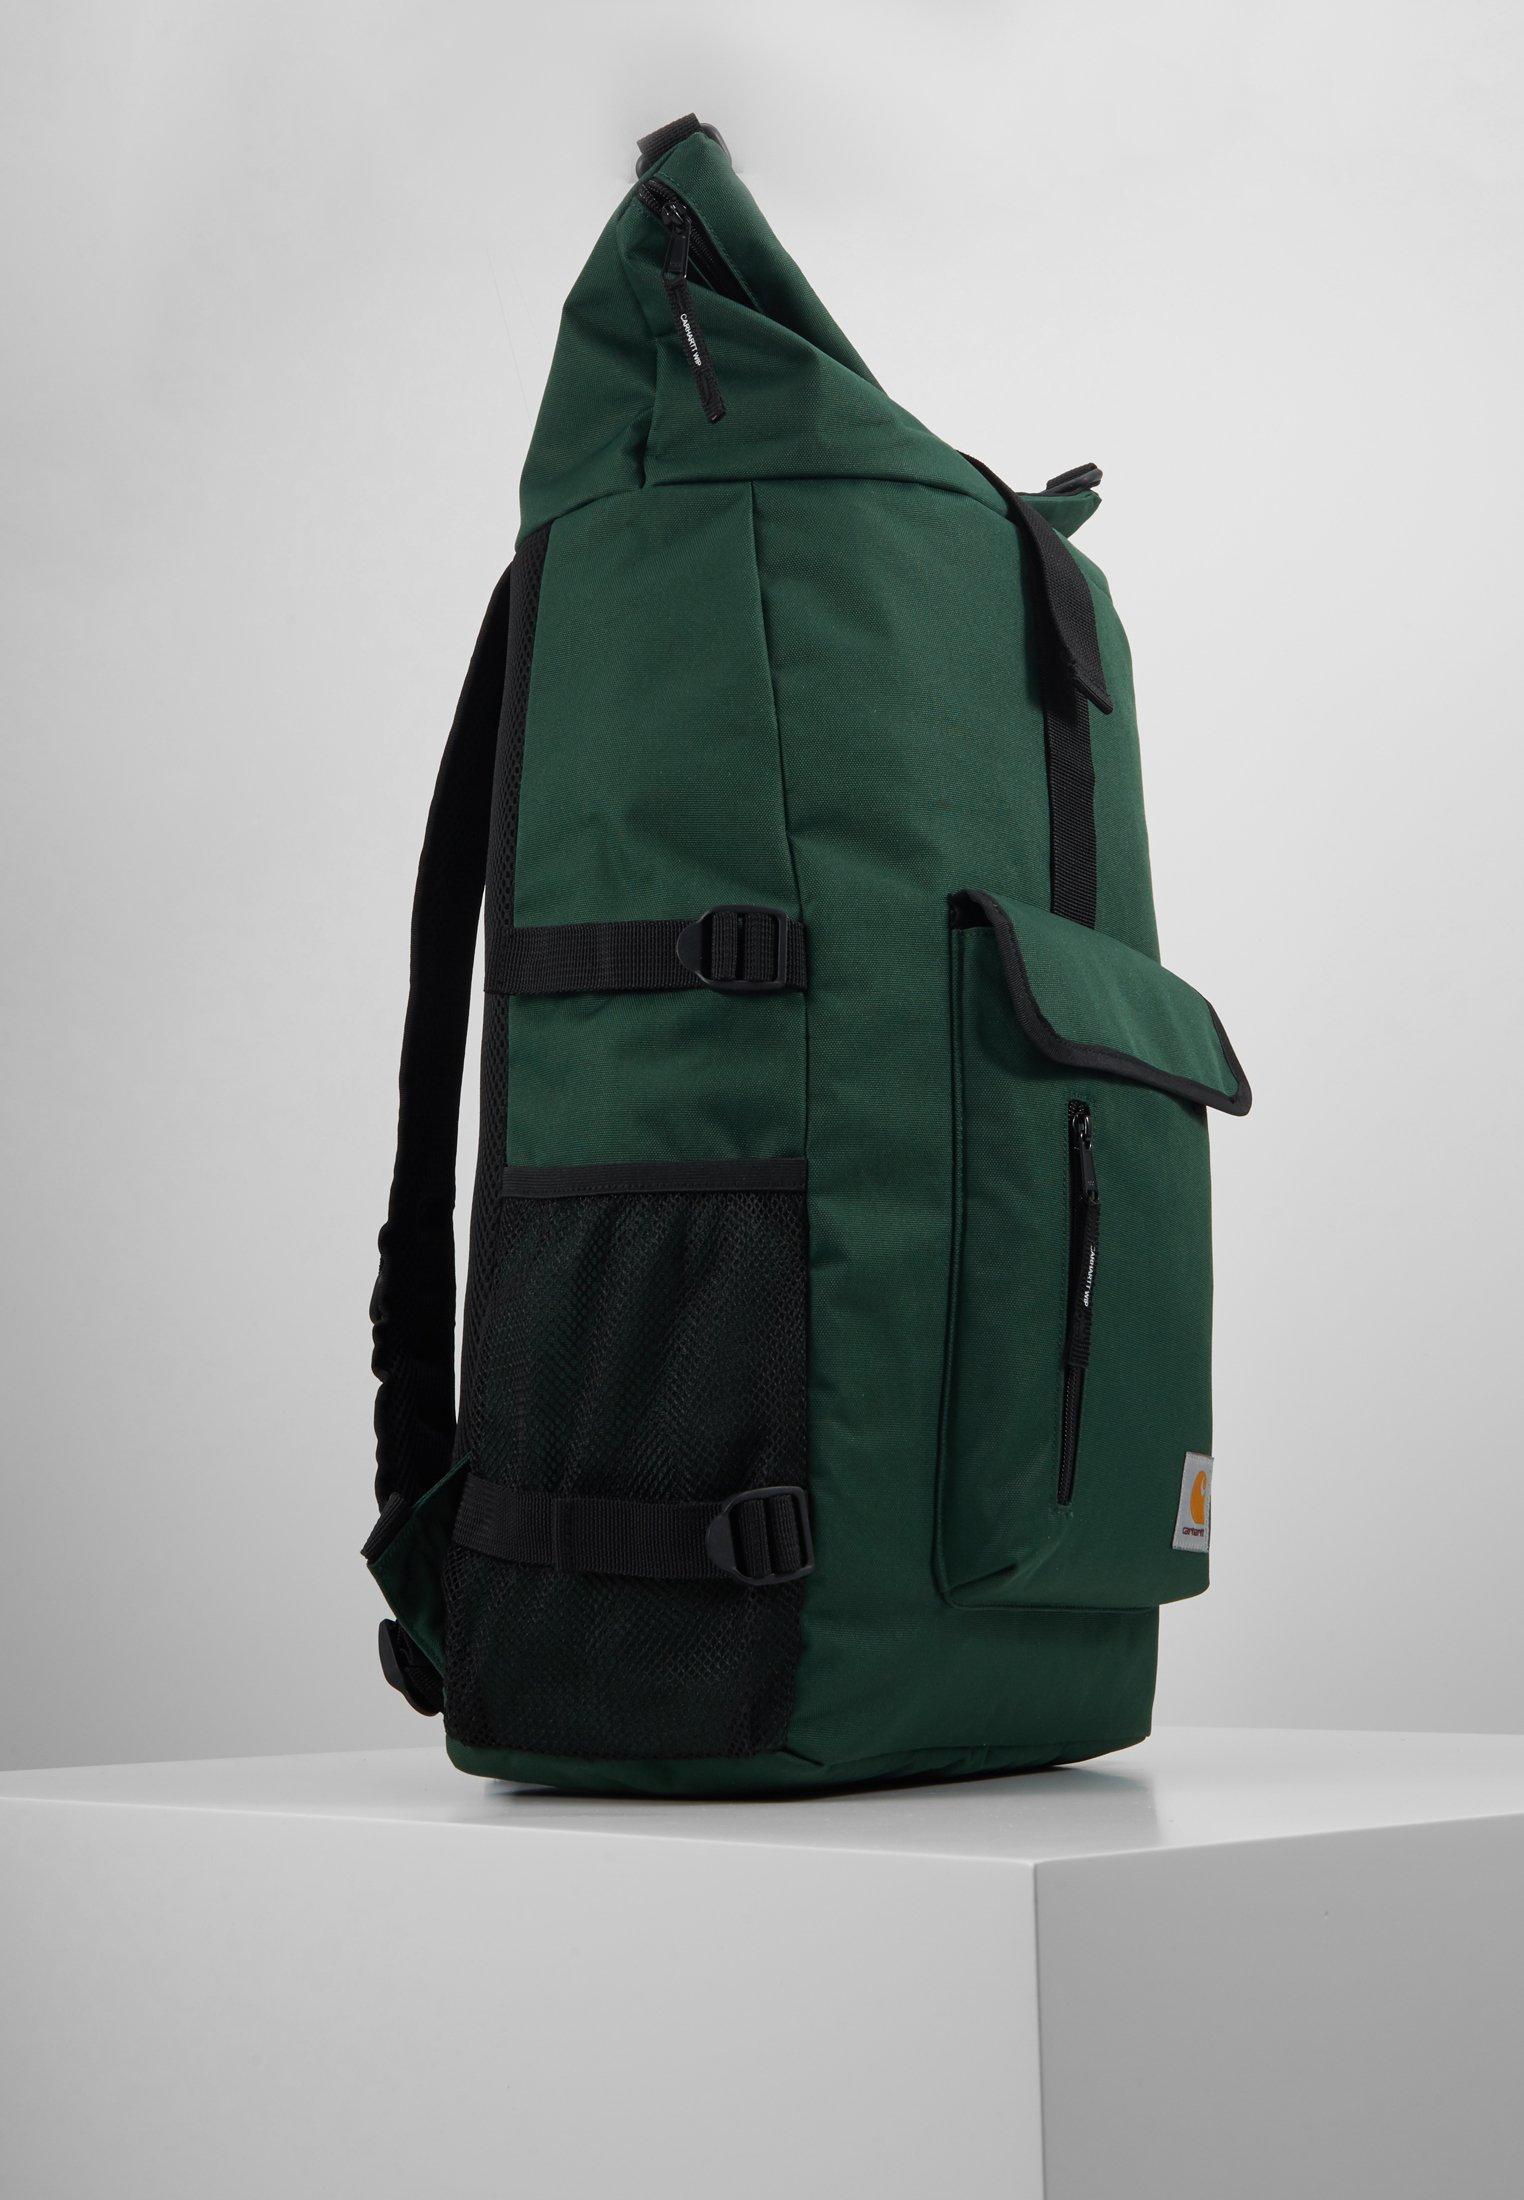 Carhartt Wip Philis Backpack - Sac À Dos Treehouse